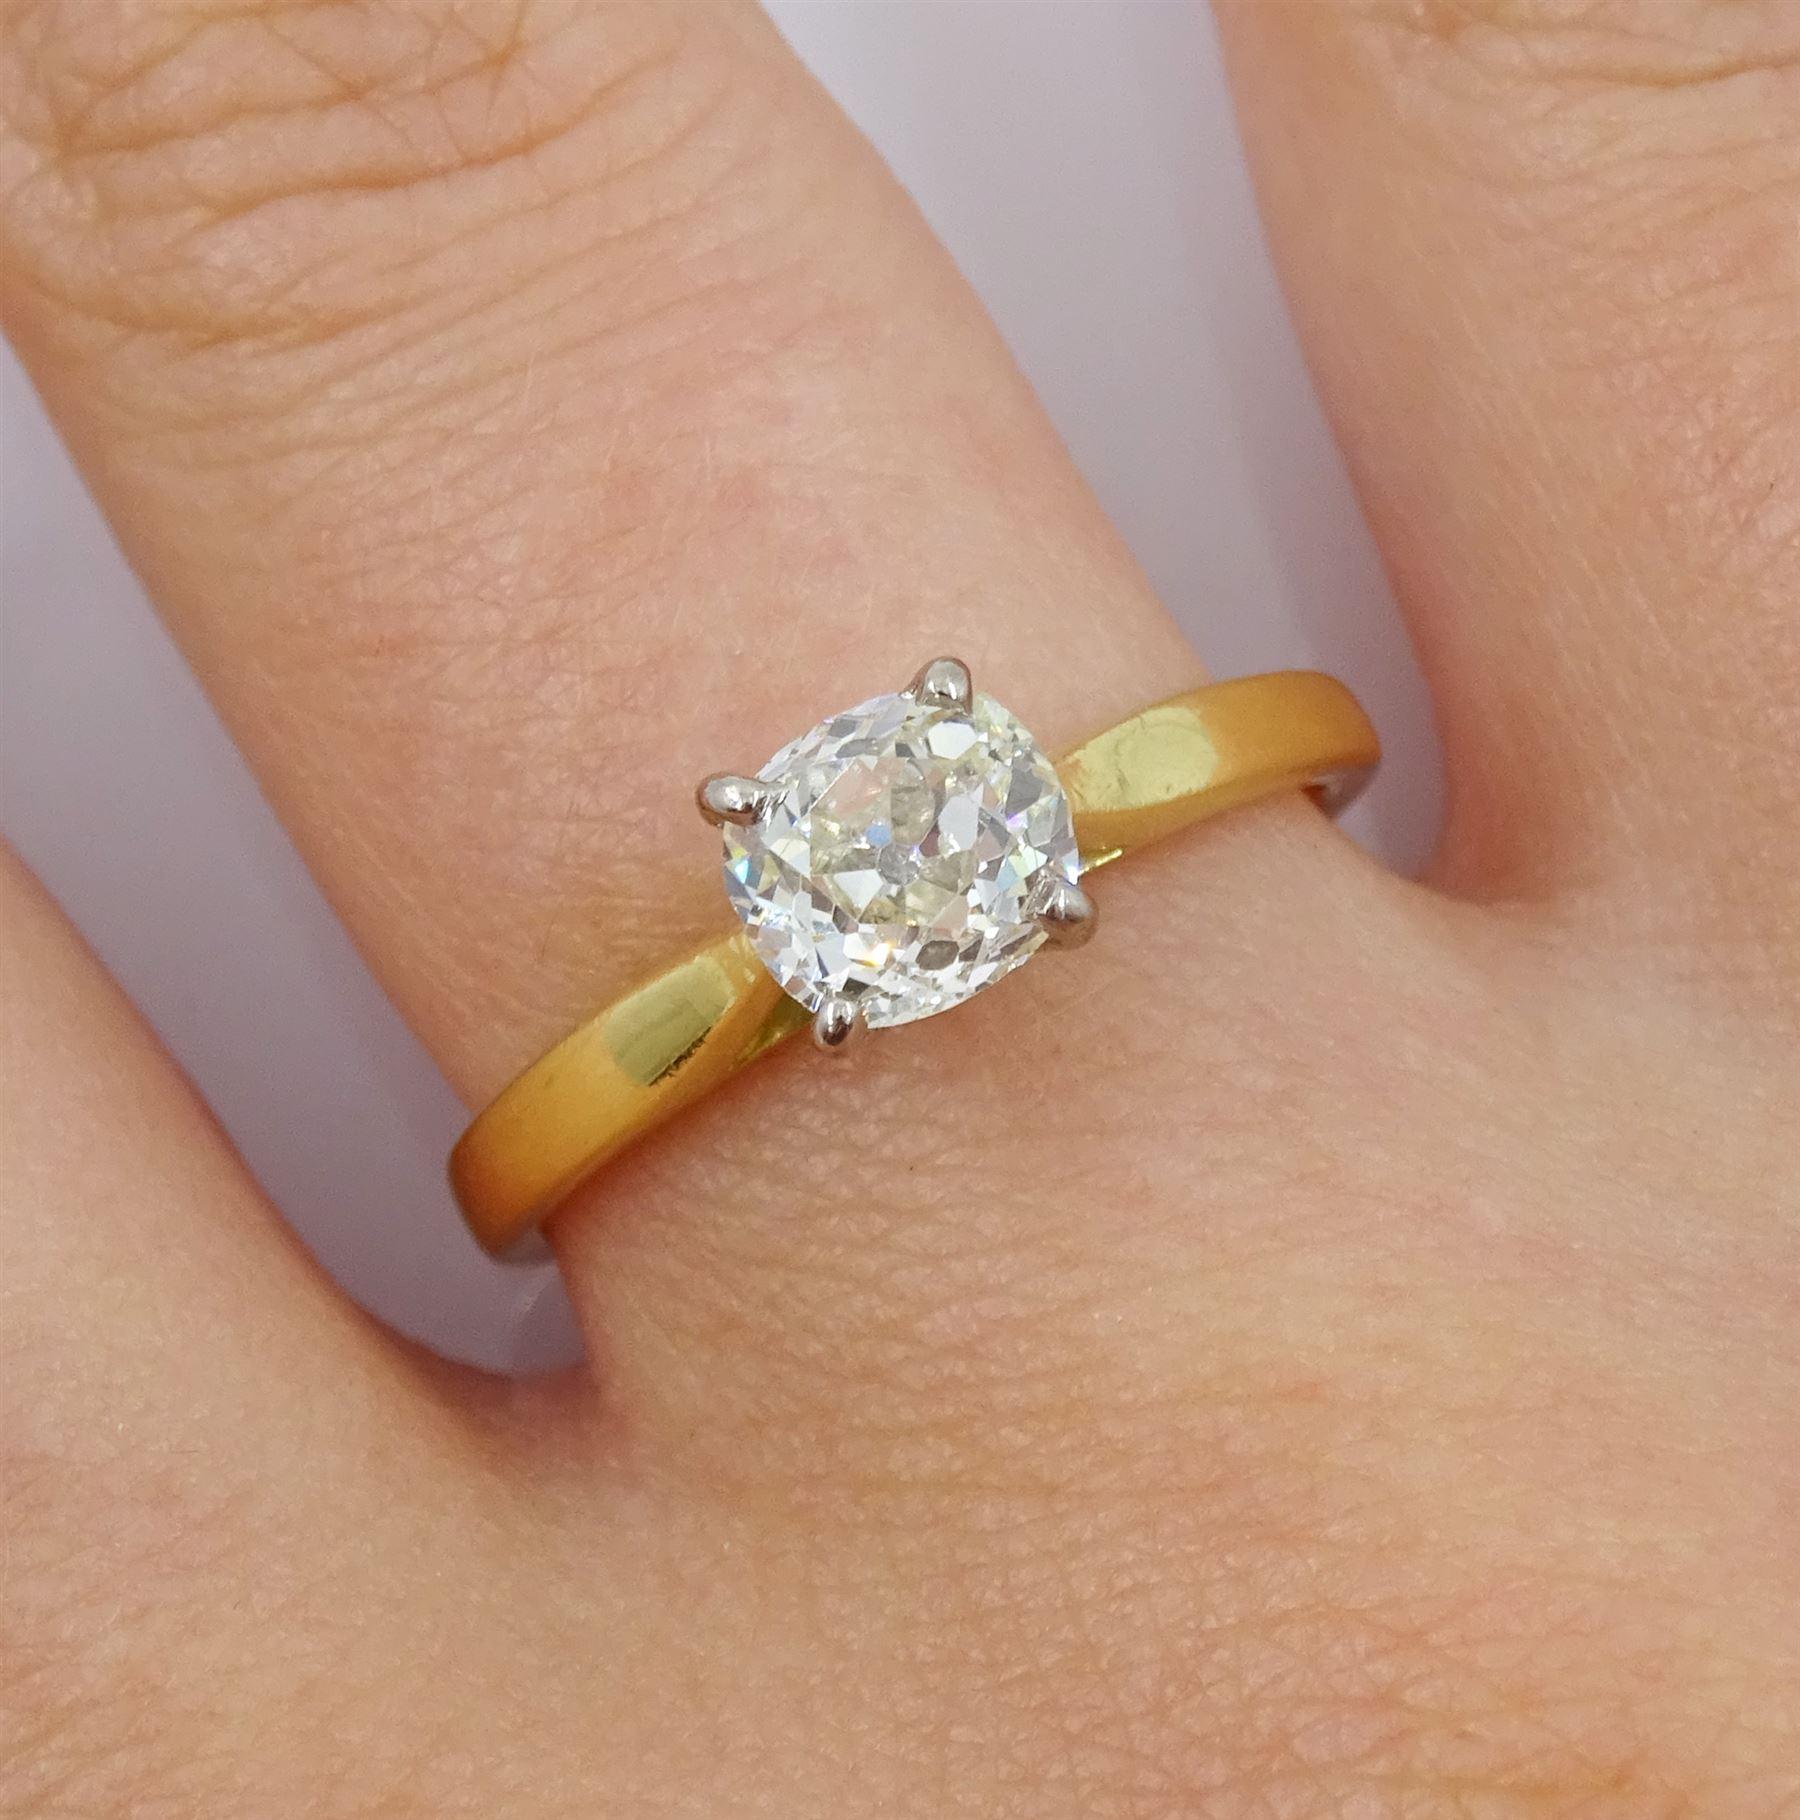 18ct gold single stone old cut diamond ring - Image 2 of 4